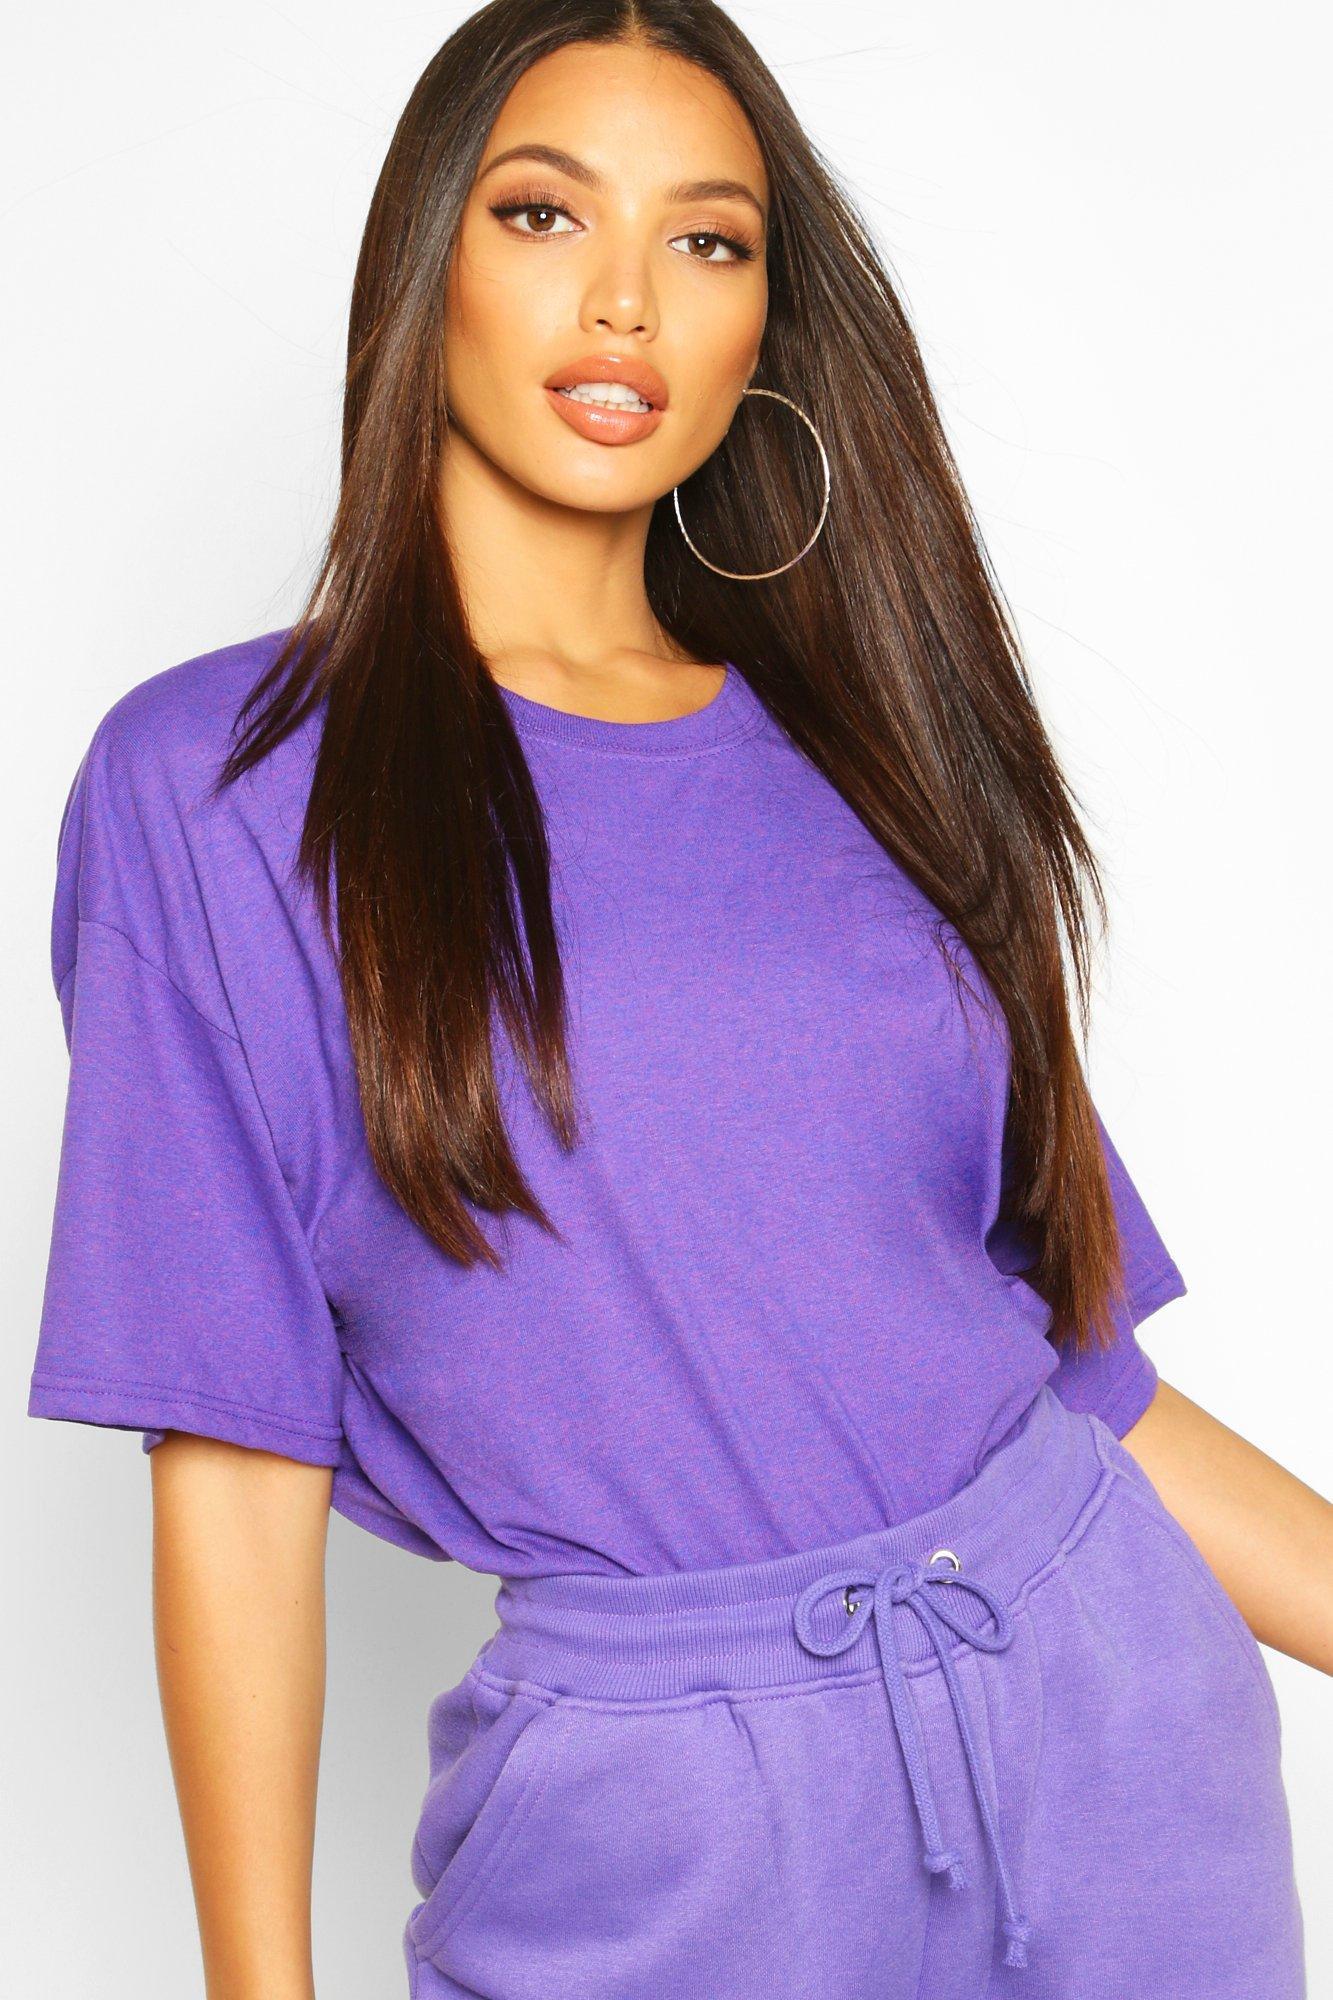 Womens Oversized T-Shirt - violett - M, Violett - Boohoo.com